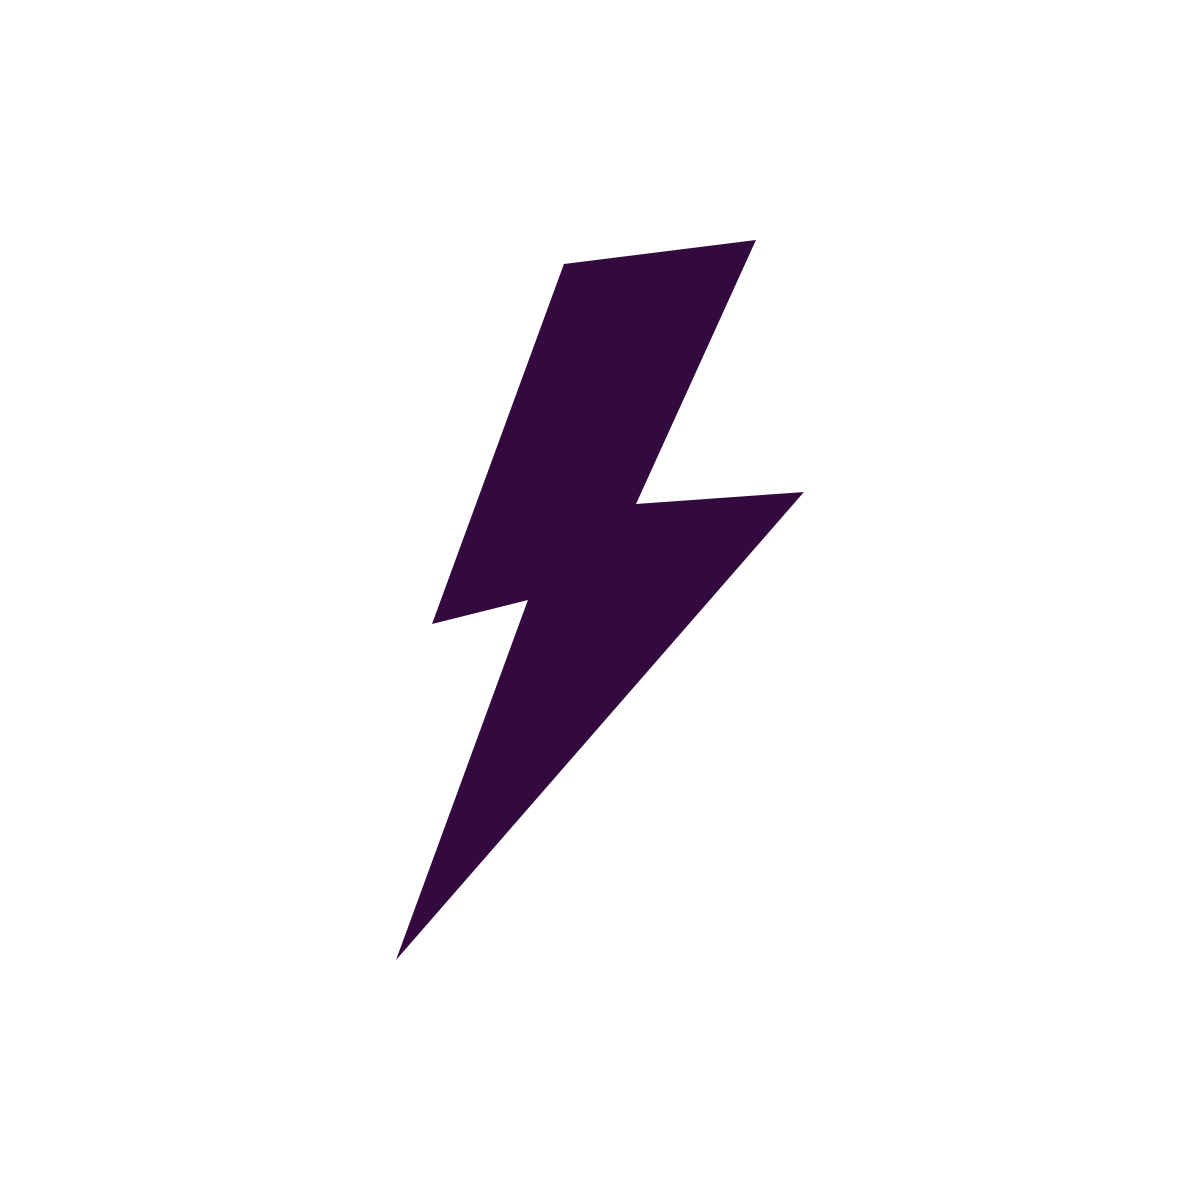 np_lightning_1105972_260331.png